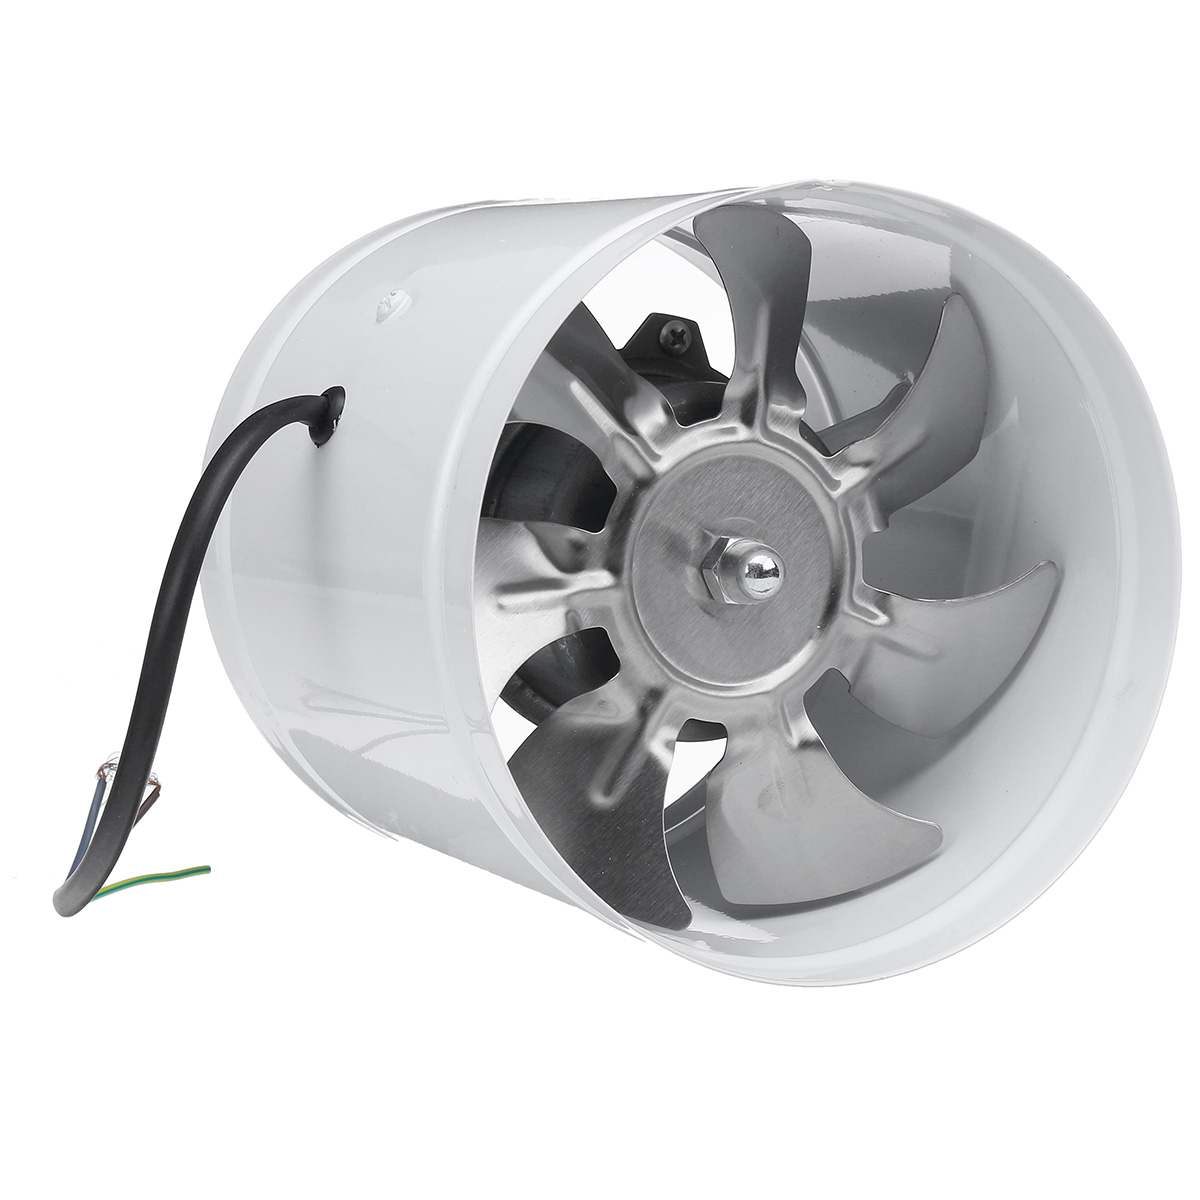 inline duct exhaust fan metal blades air blower cooling vent 6inch walmart com walmart com